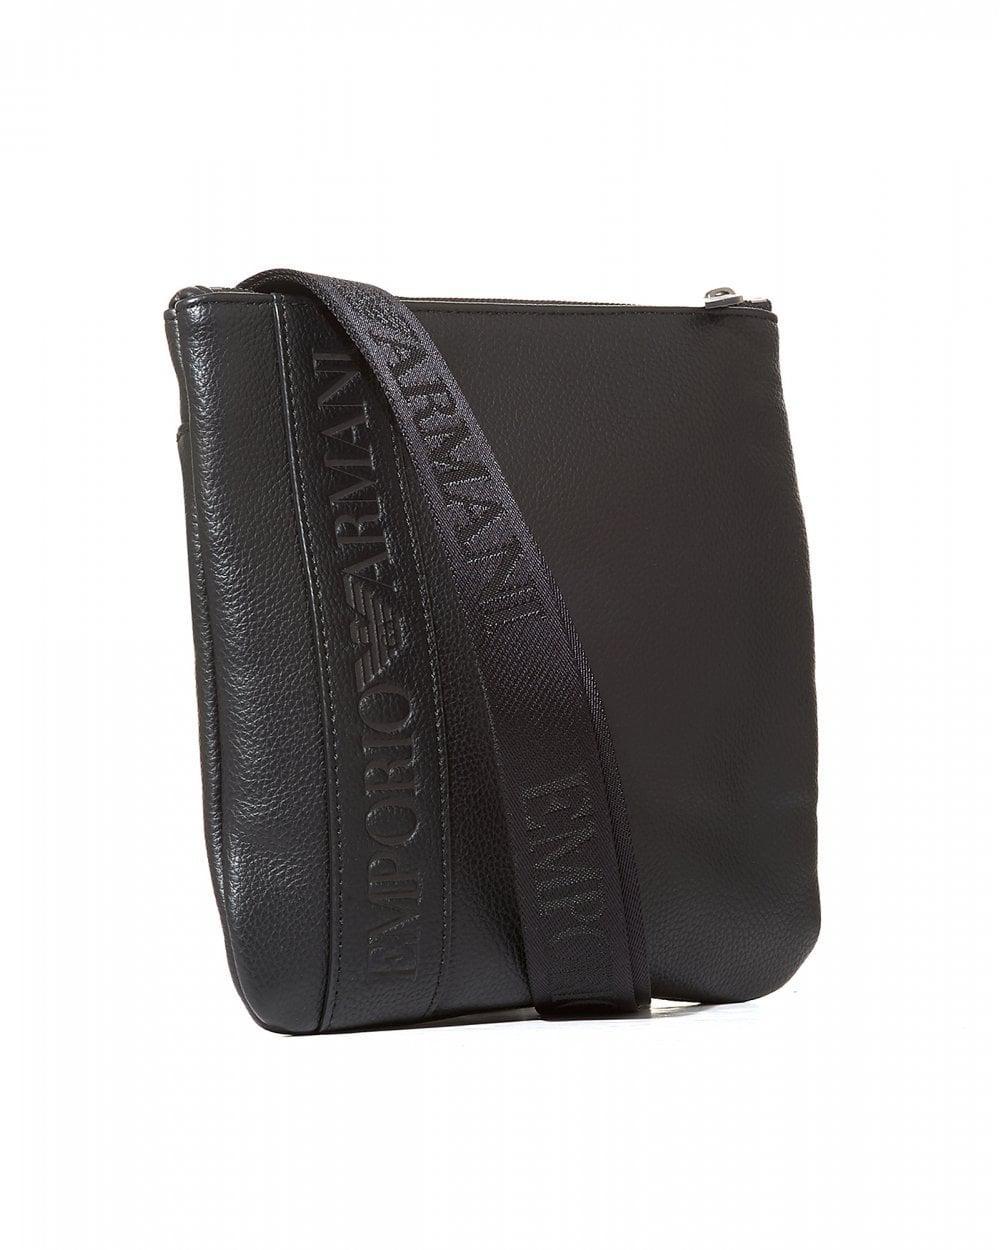 Emporio Armani Silver Eagle Logo Black Cross Body Stash Bag in Black for Men  - Save 1% - Lyst 4491b0ead60b9